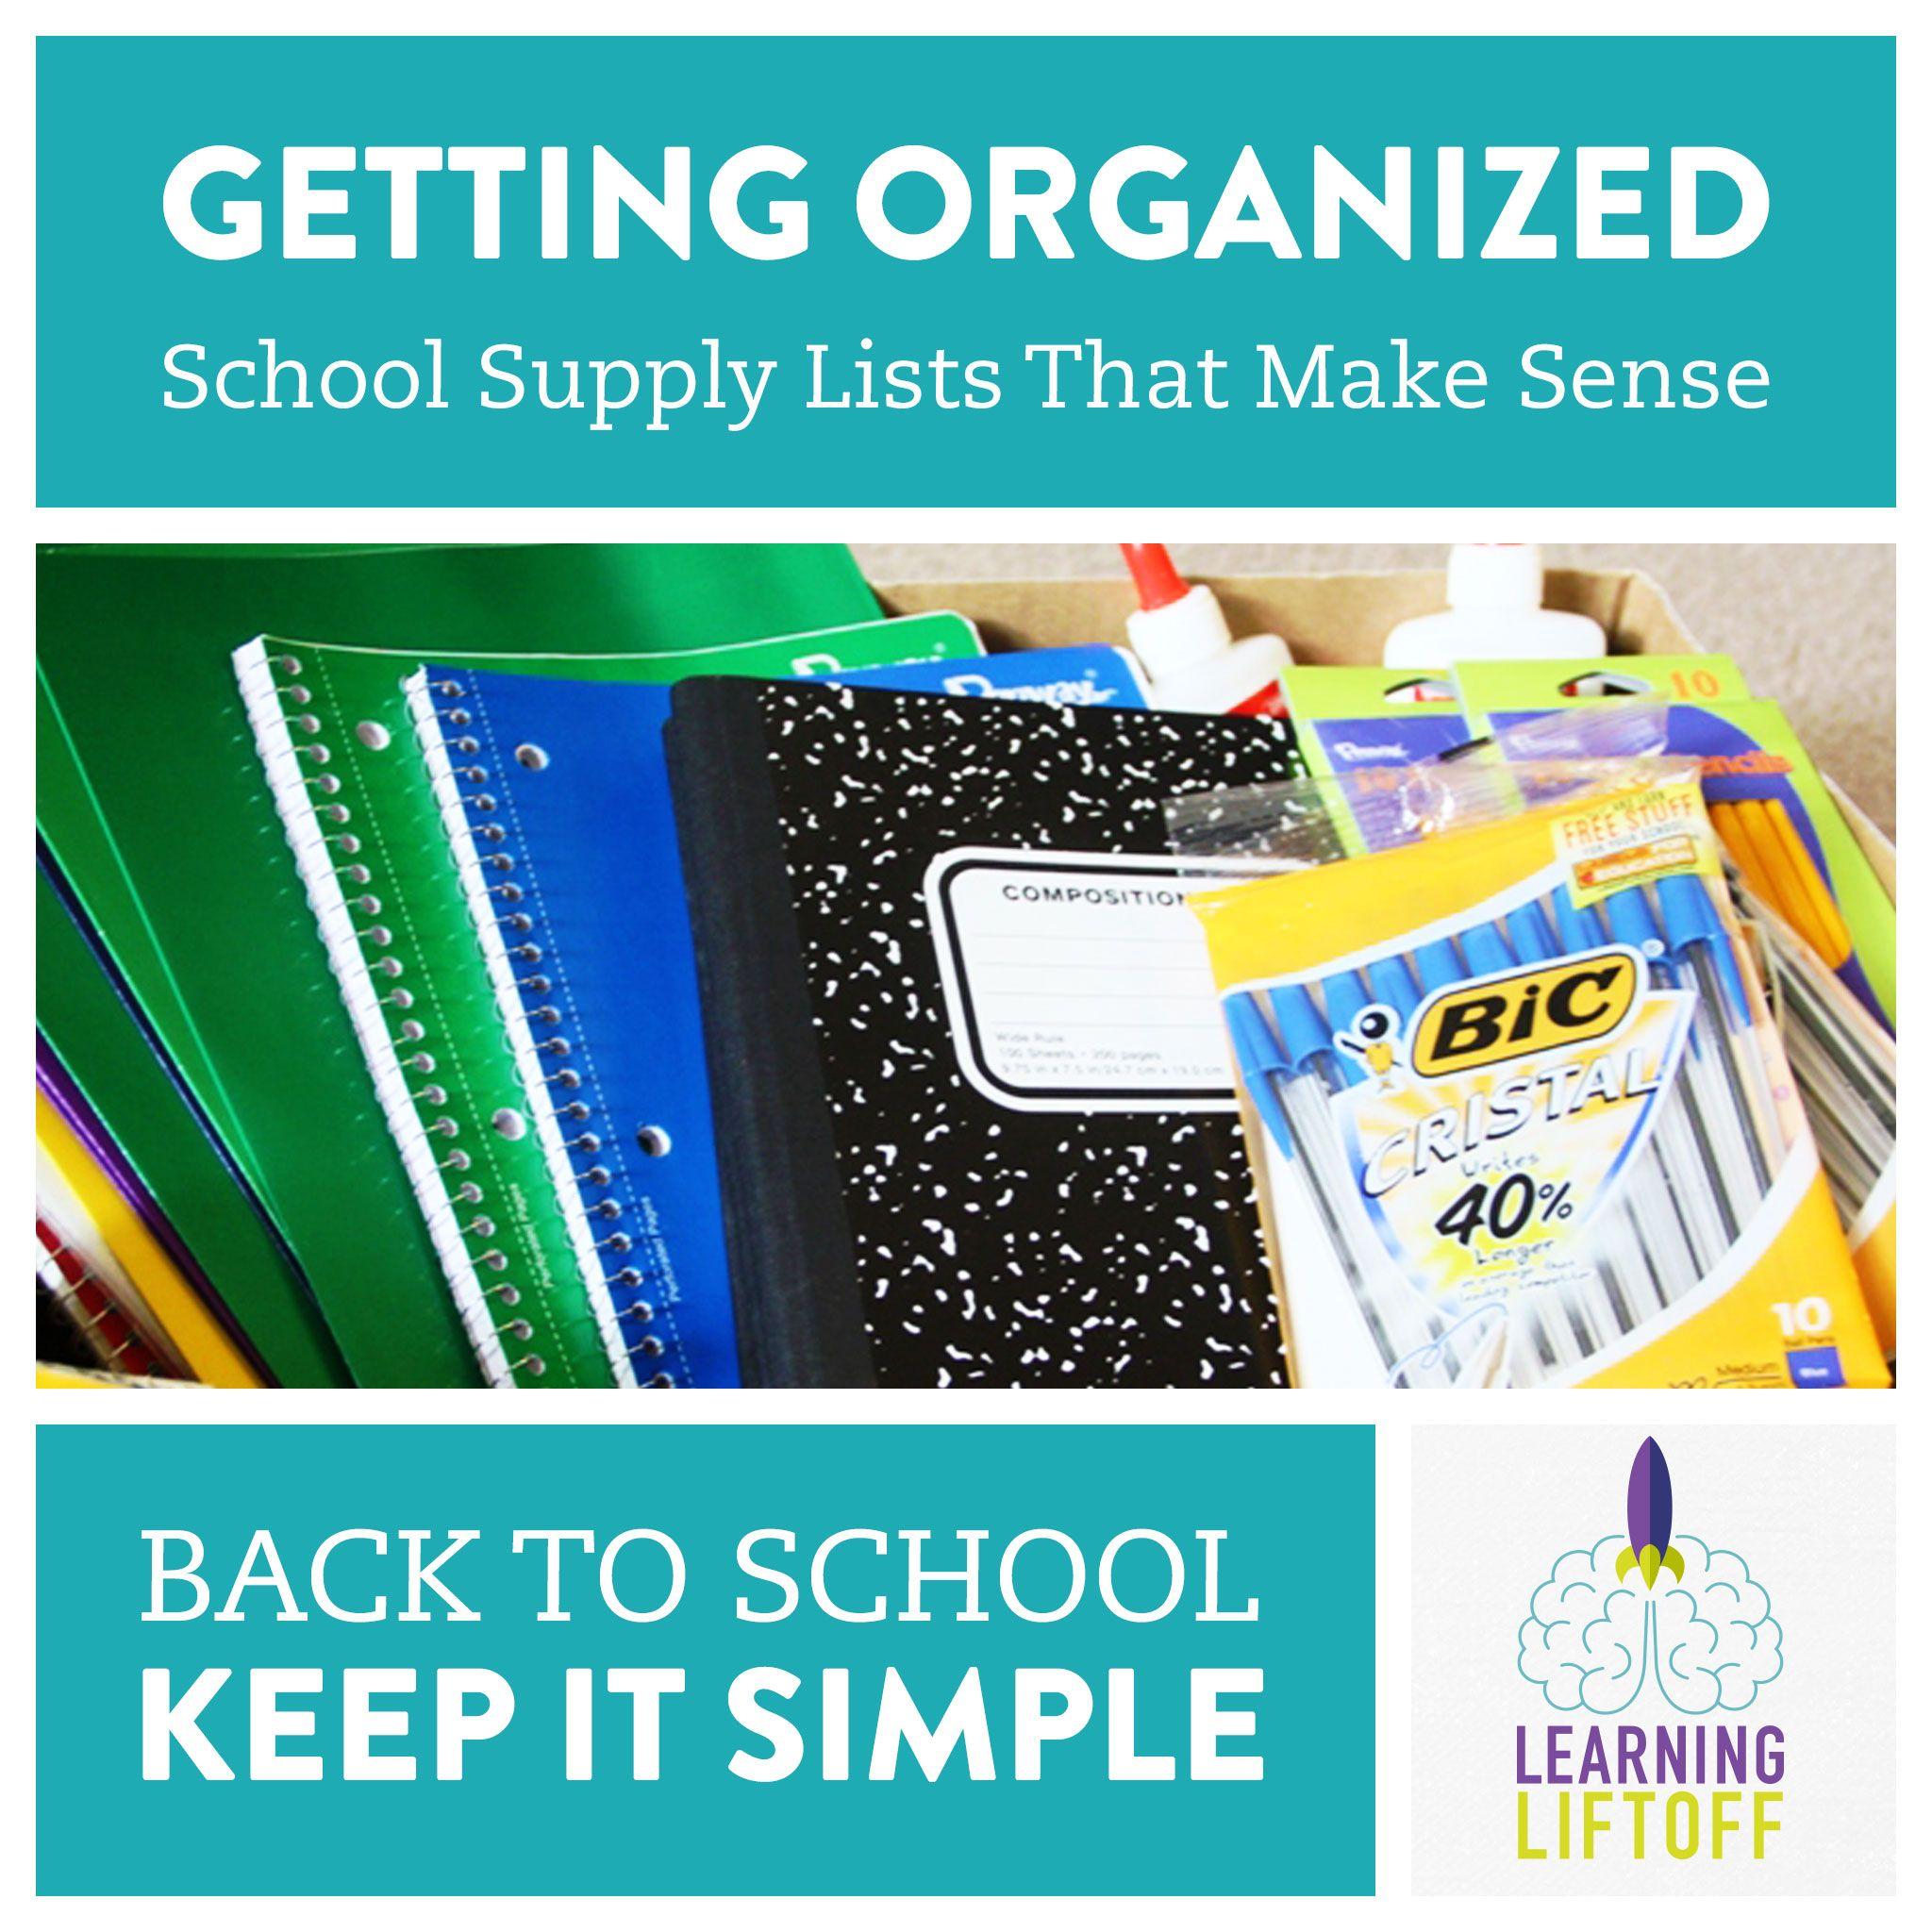 Back to School: School Supply Lists that Make Sense | Back